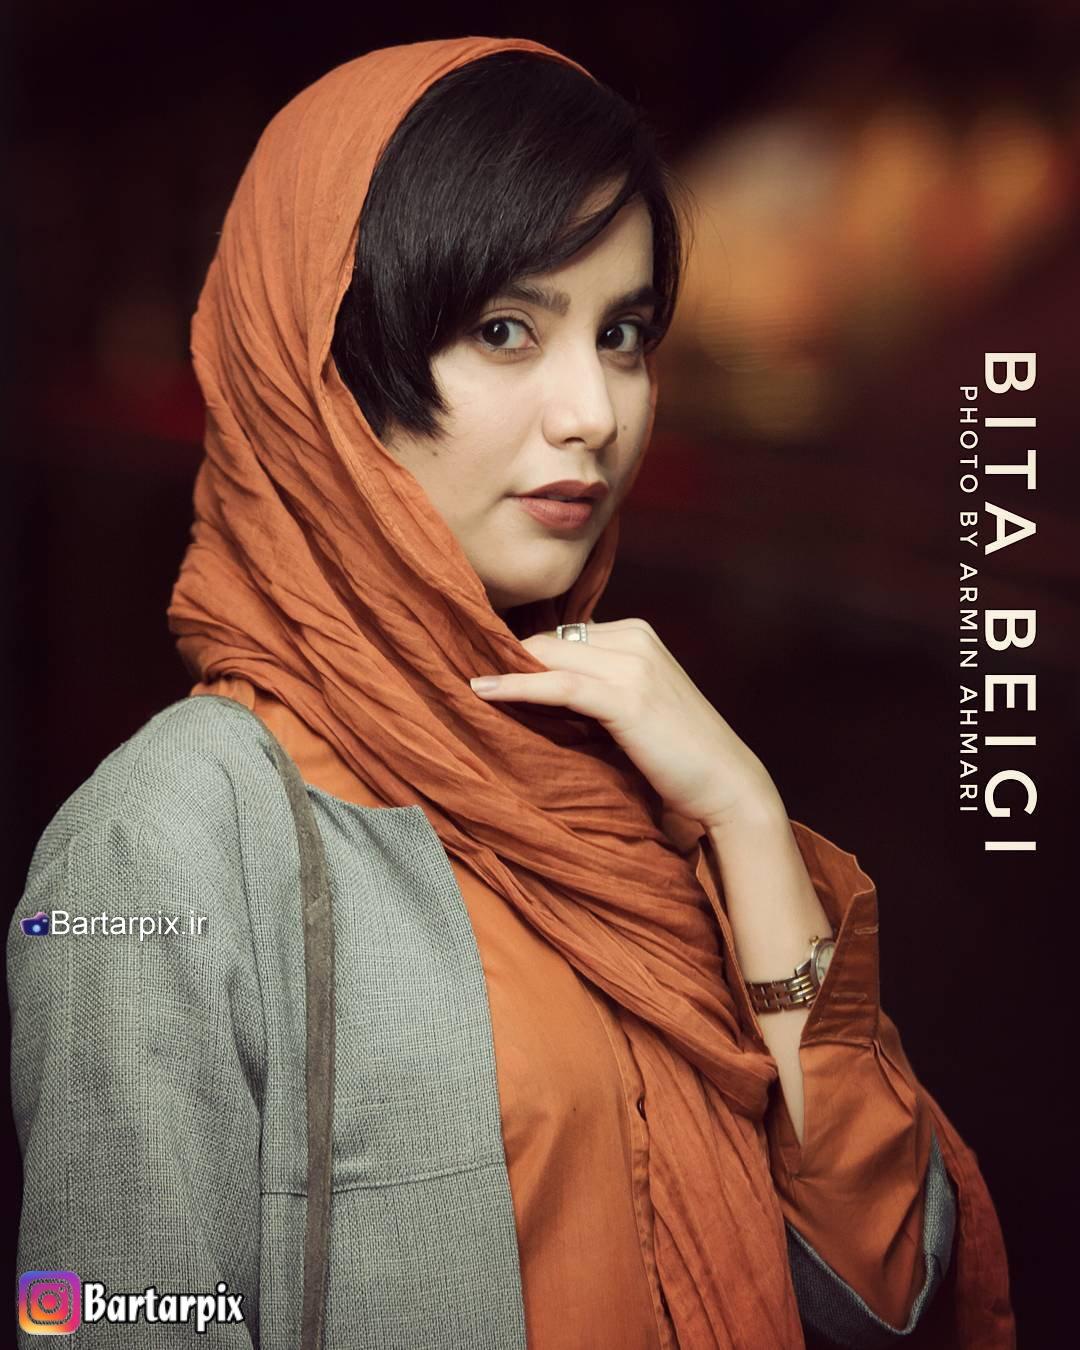 http://s8.picofile.com/file/8303455392/www_bartarpix_ir_bita_beigi_mordad_96.jpg